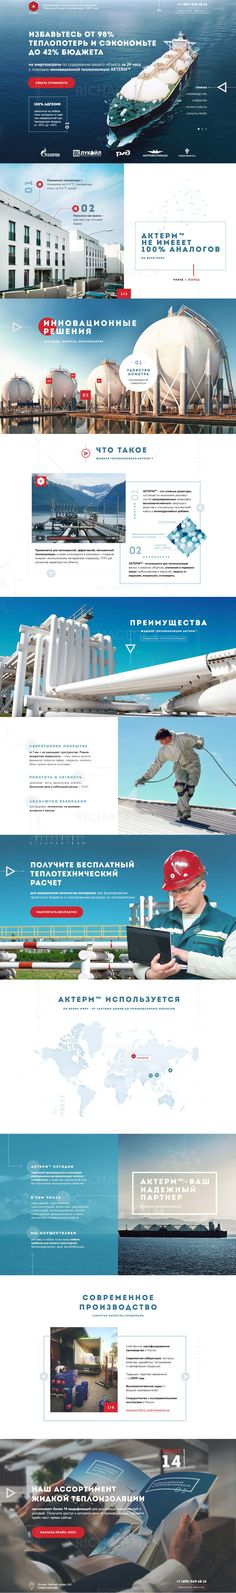 Website Layout, Web Layout, Layout Design, Website Ideas, Gui Interface, User Interface Design, Corporate Design, Website Design Services, Newsletter Design